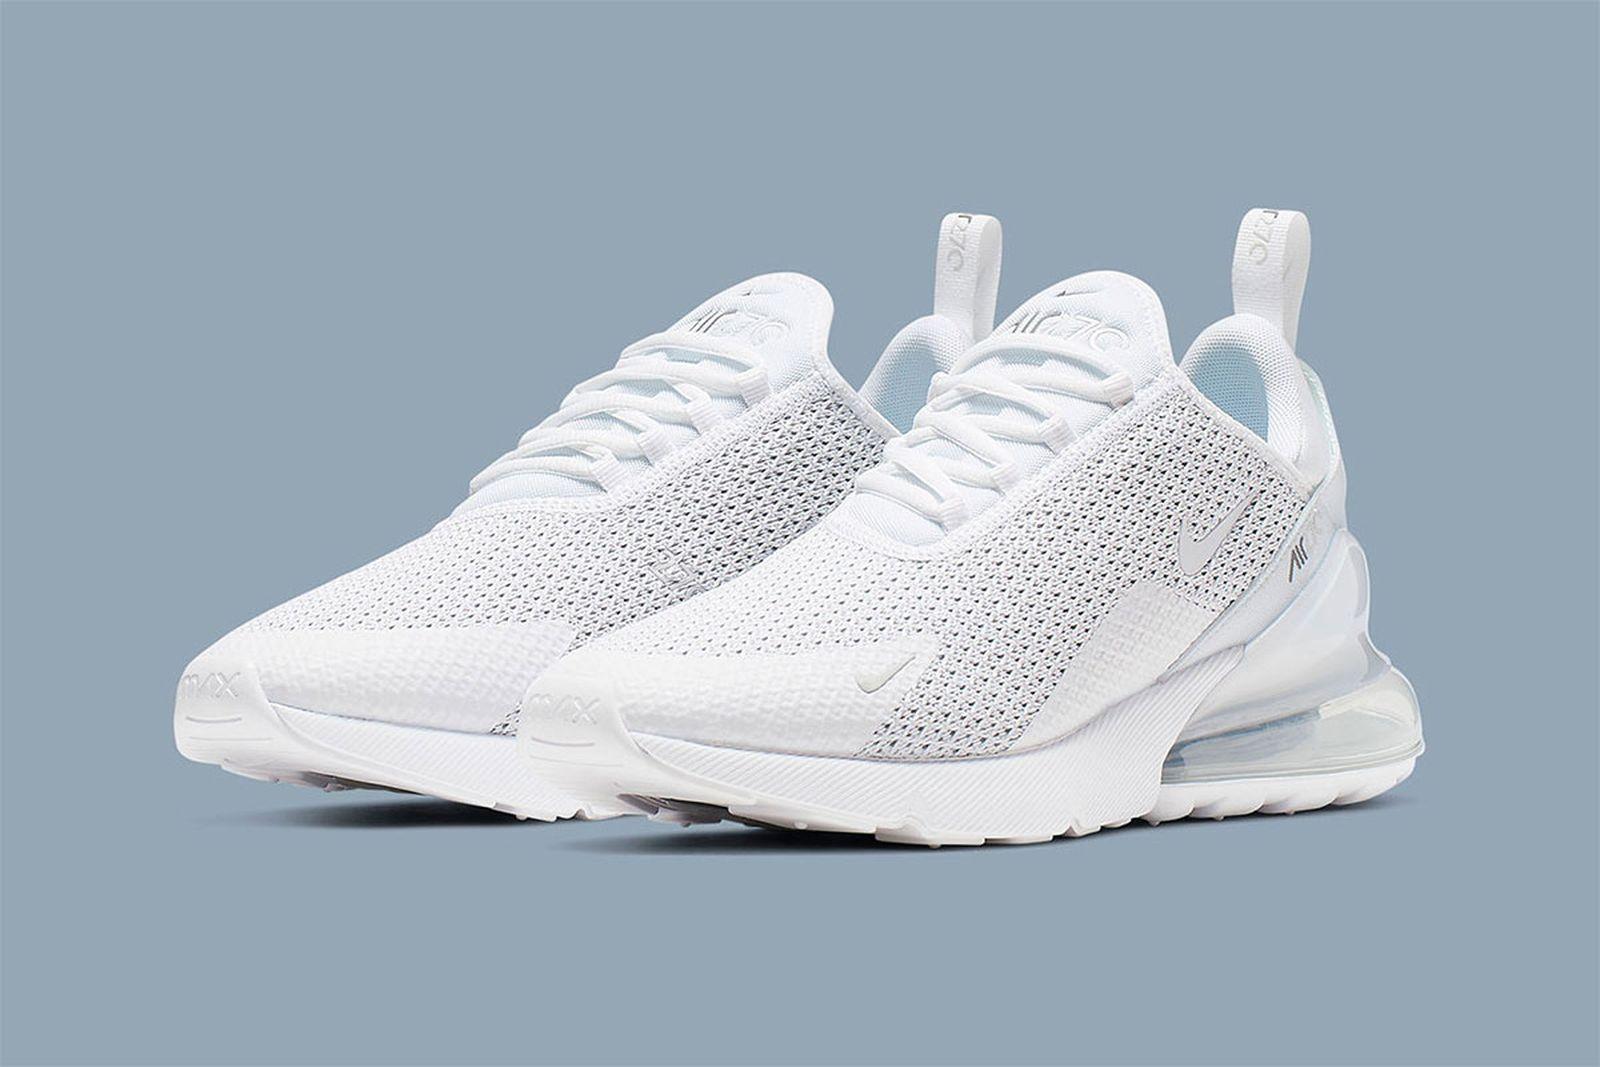 nike air max 270 platinum white release date price info